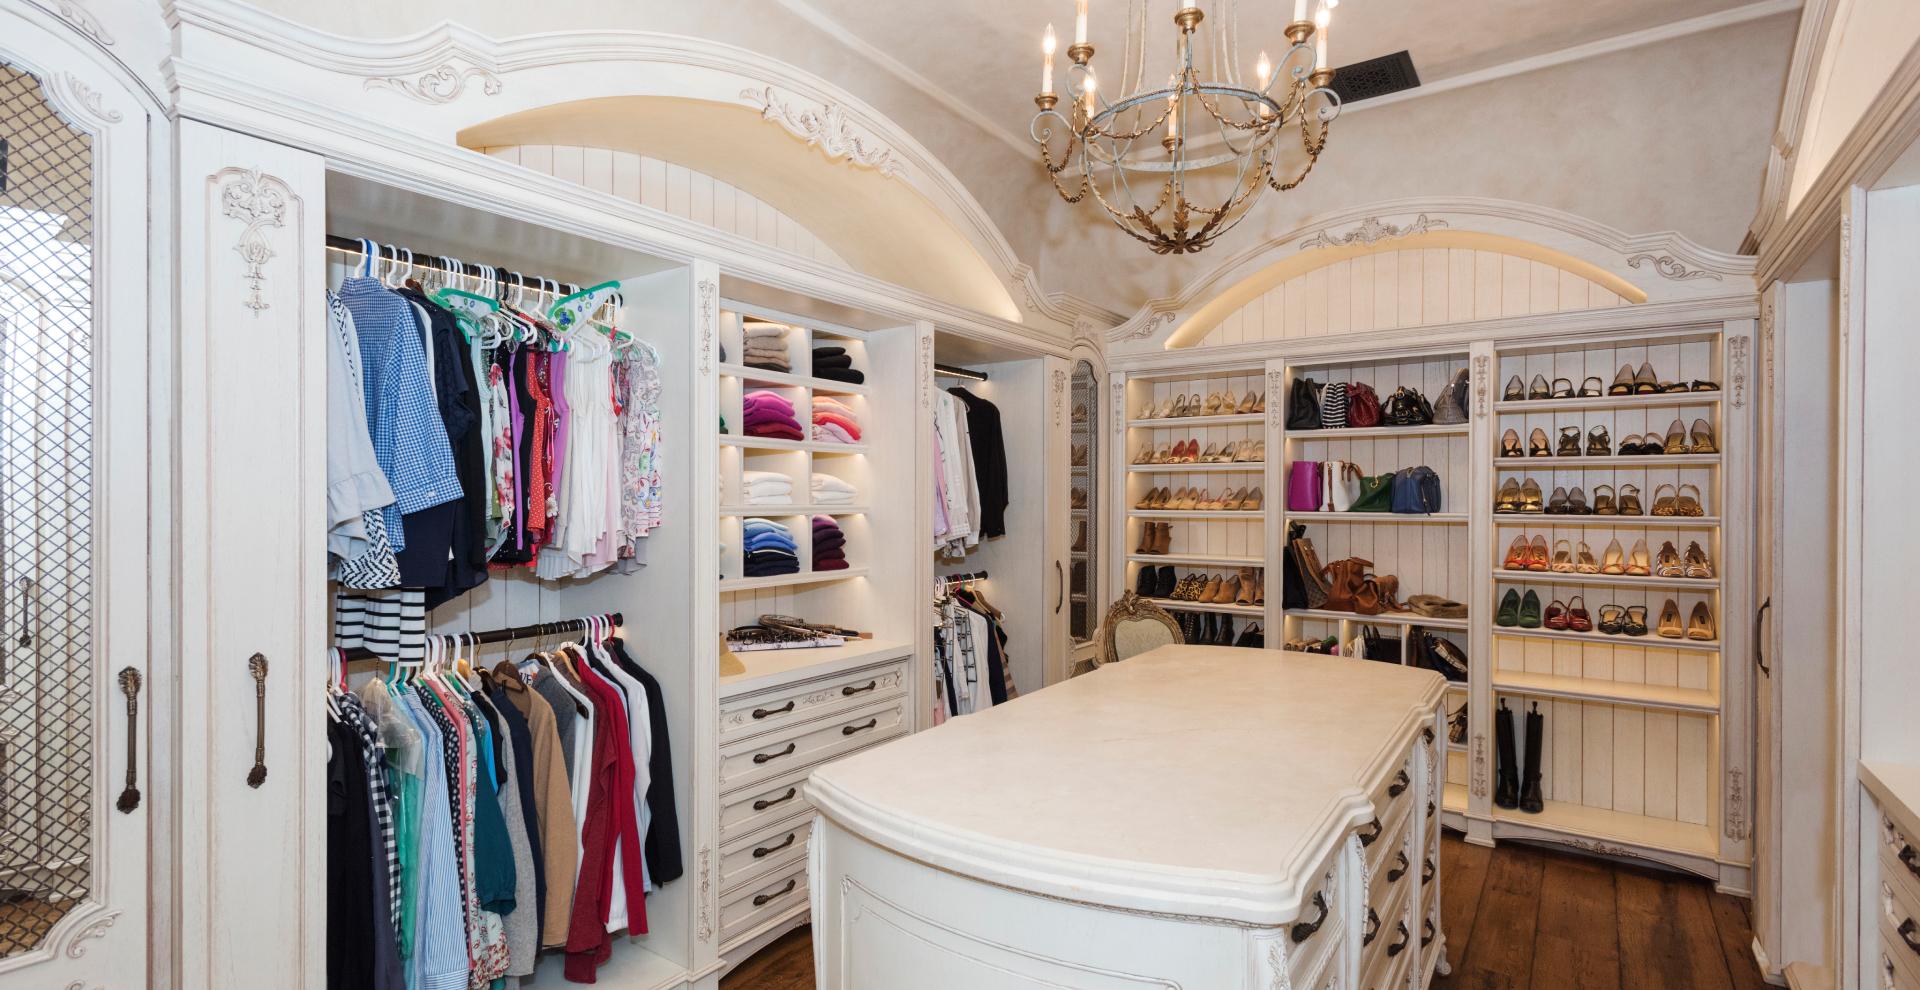 French provincial styled closet Saddle River, NJ.